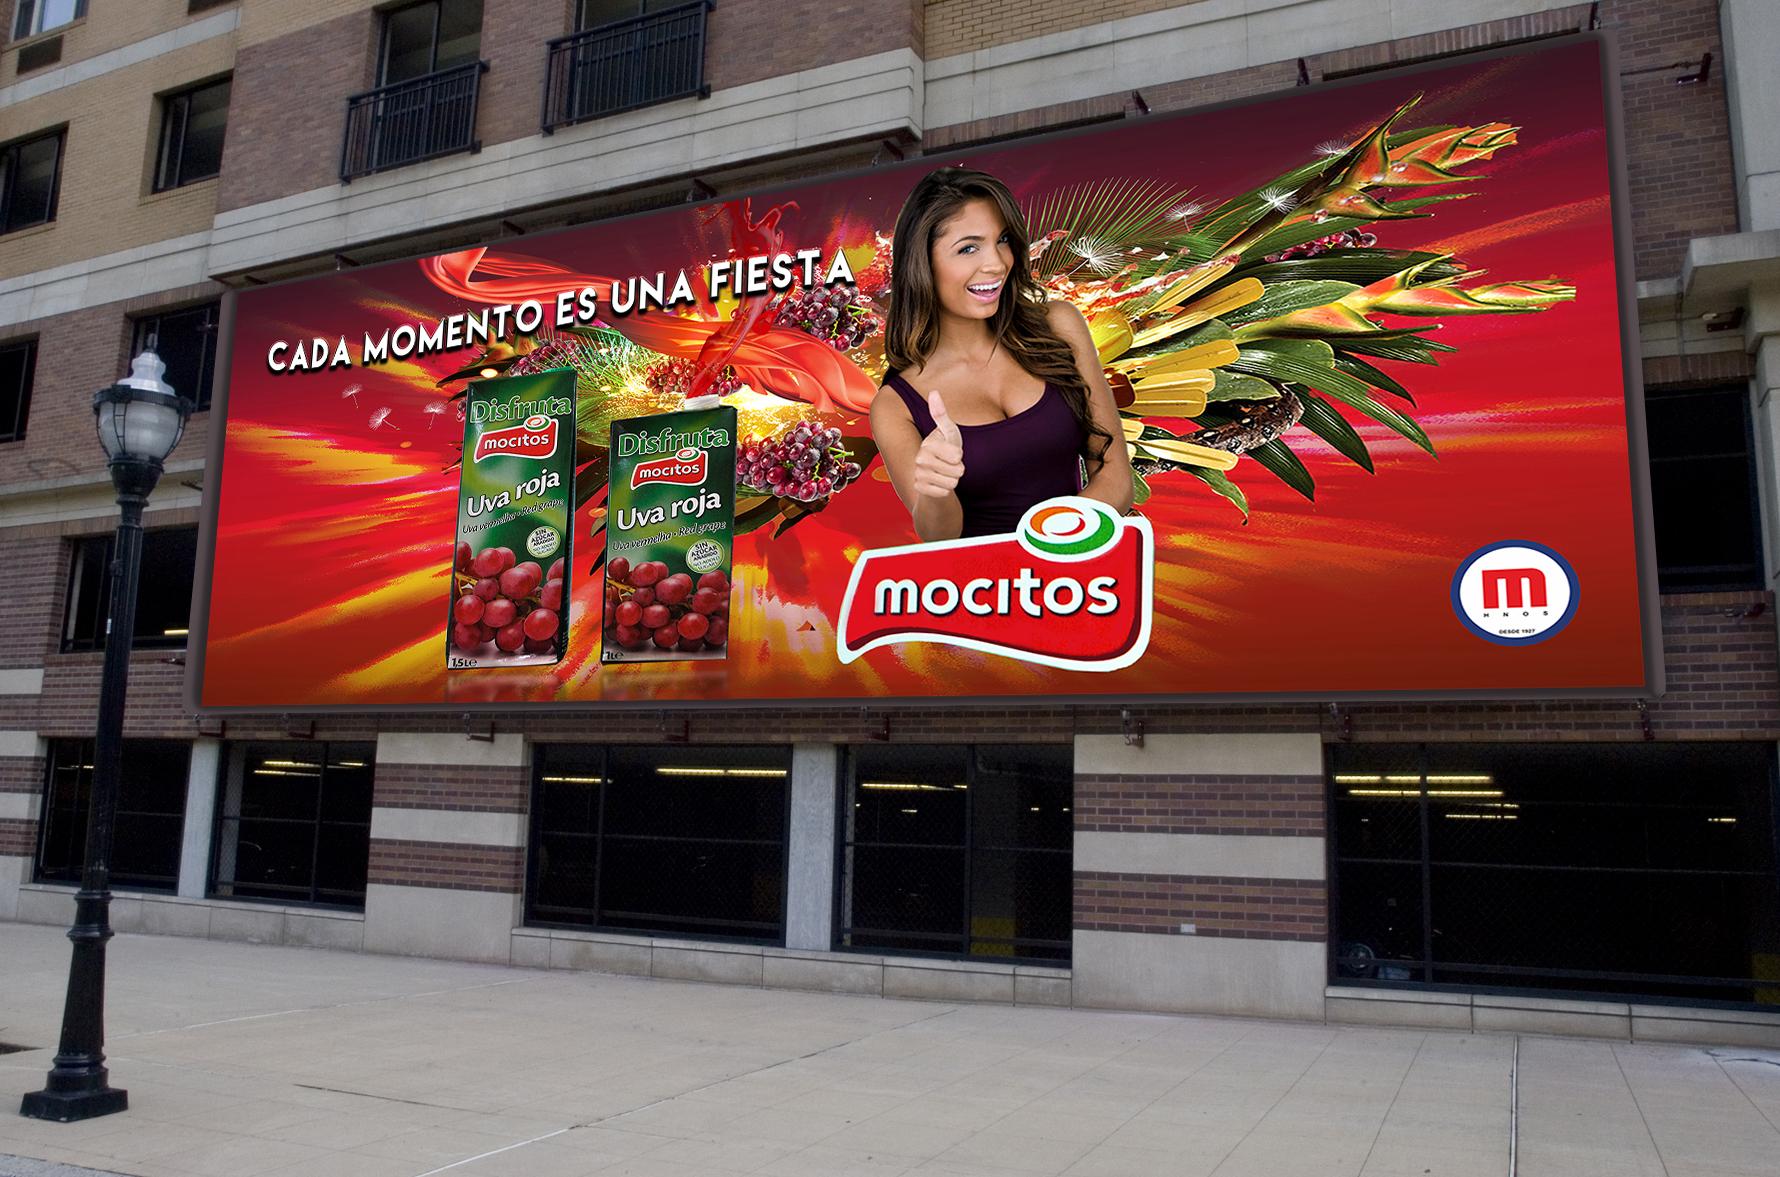 Campagne publicitaire Mocitos